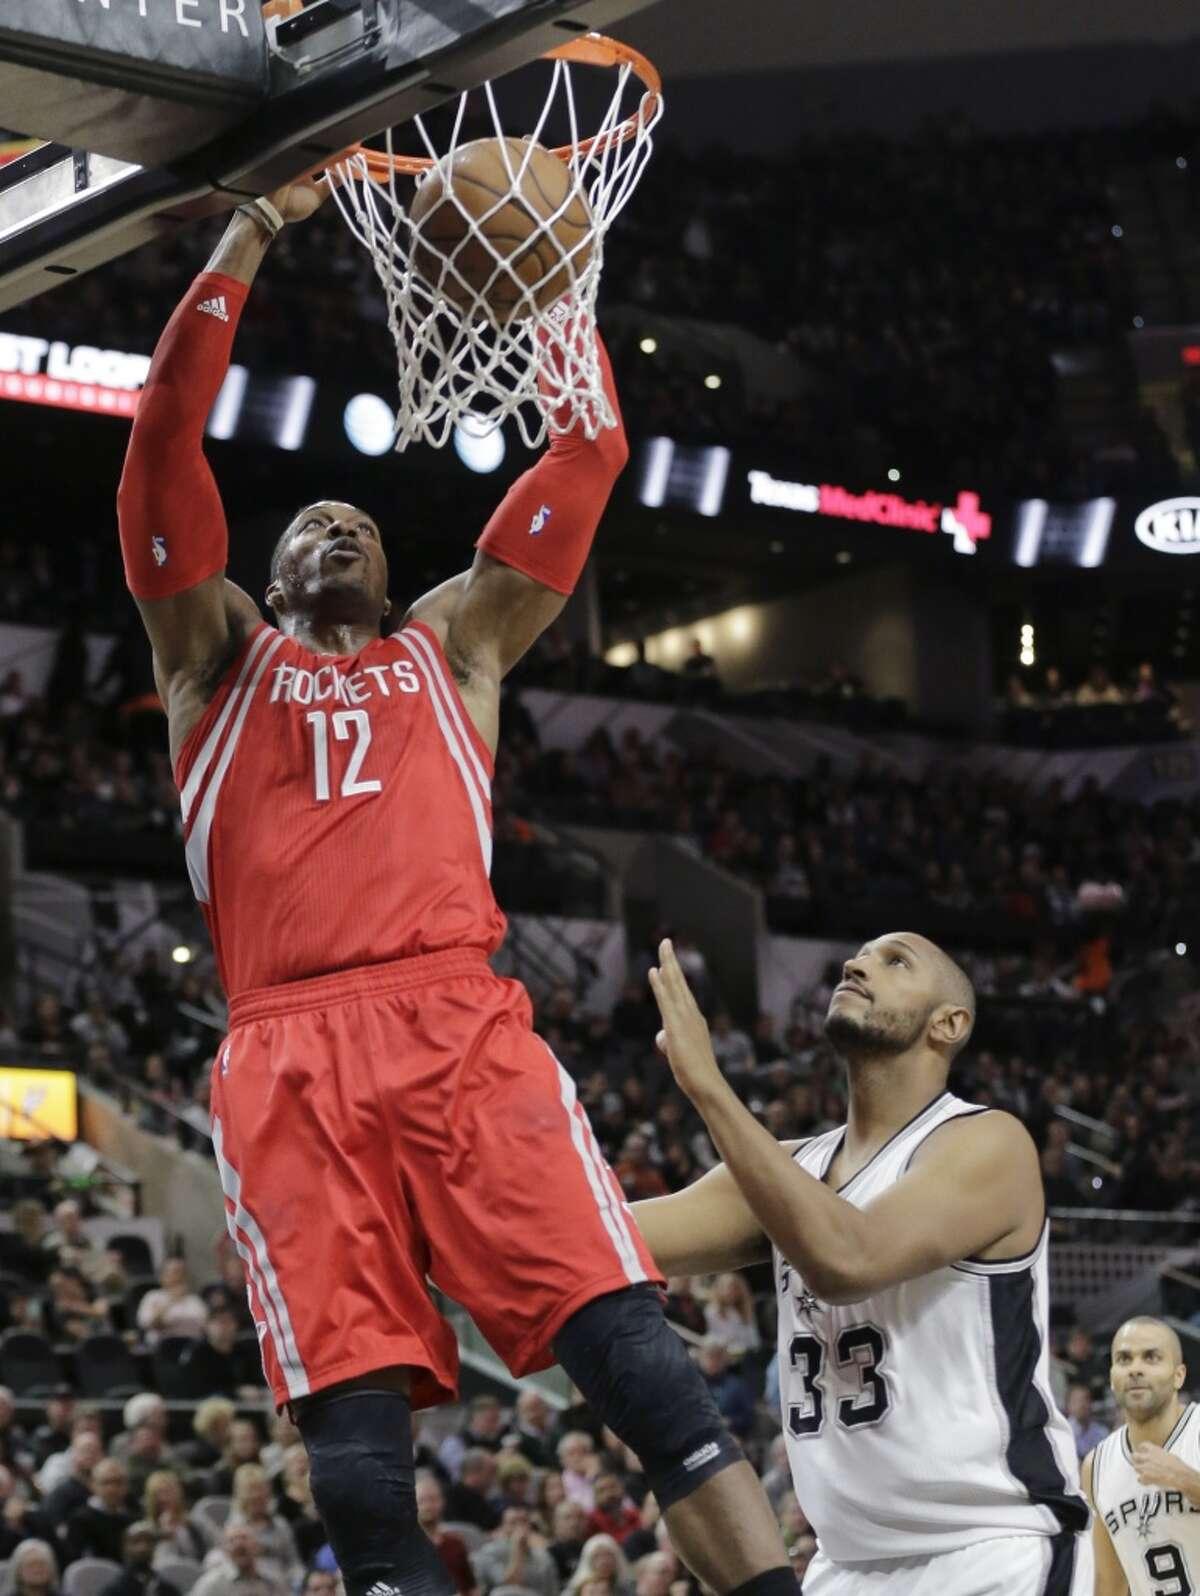 Houston Rockets center Dwight Howard (12) scores over San Antonio Spurs center Boris Diaw (33) during the first half of an NBA basketball game, Wednesday, Jan. 27, 2016, in San Antonio. (AP Photo/Eric Gay)